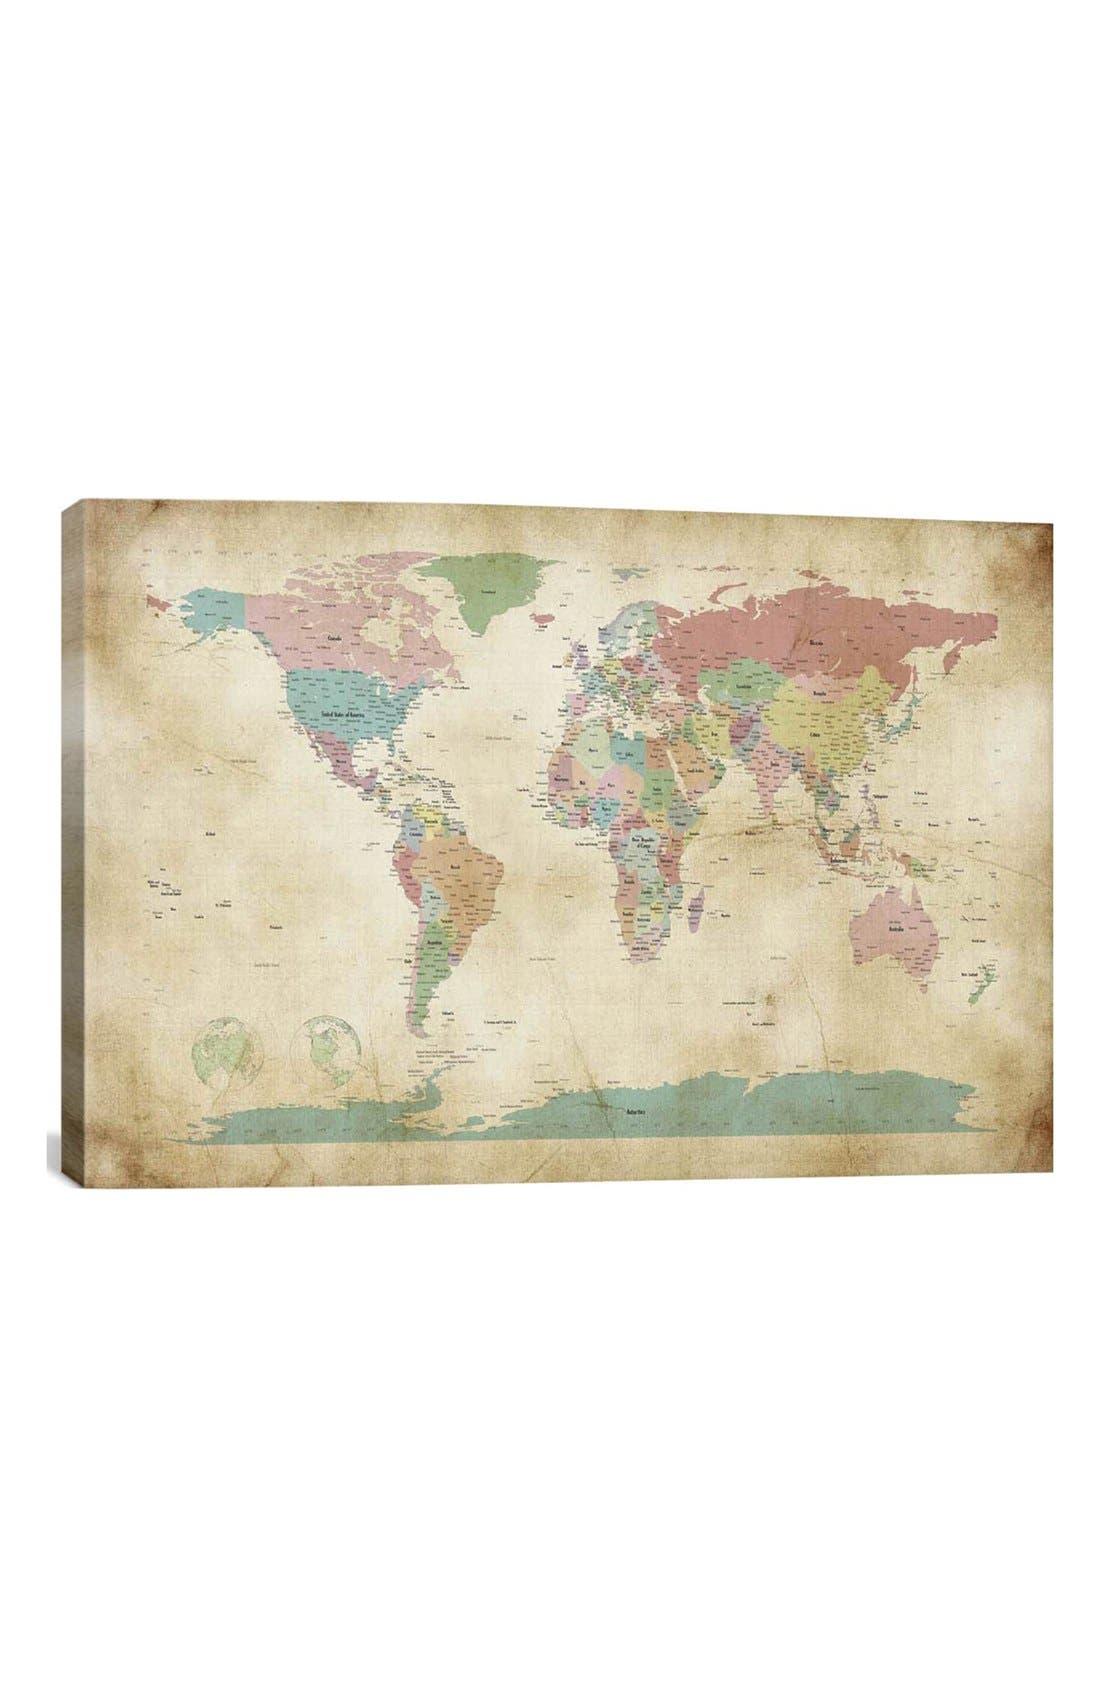 'World Cities Map - Michael Thompsett' Giclée Print Canvas Art,                         Main,                         color, BROWN/ MULTI